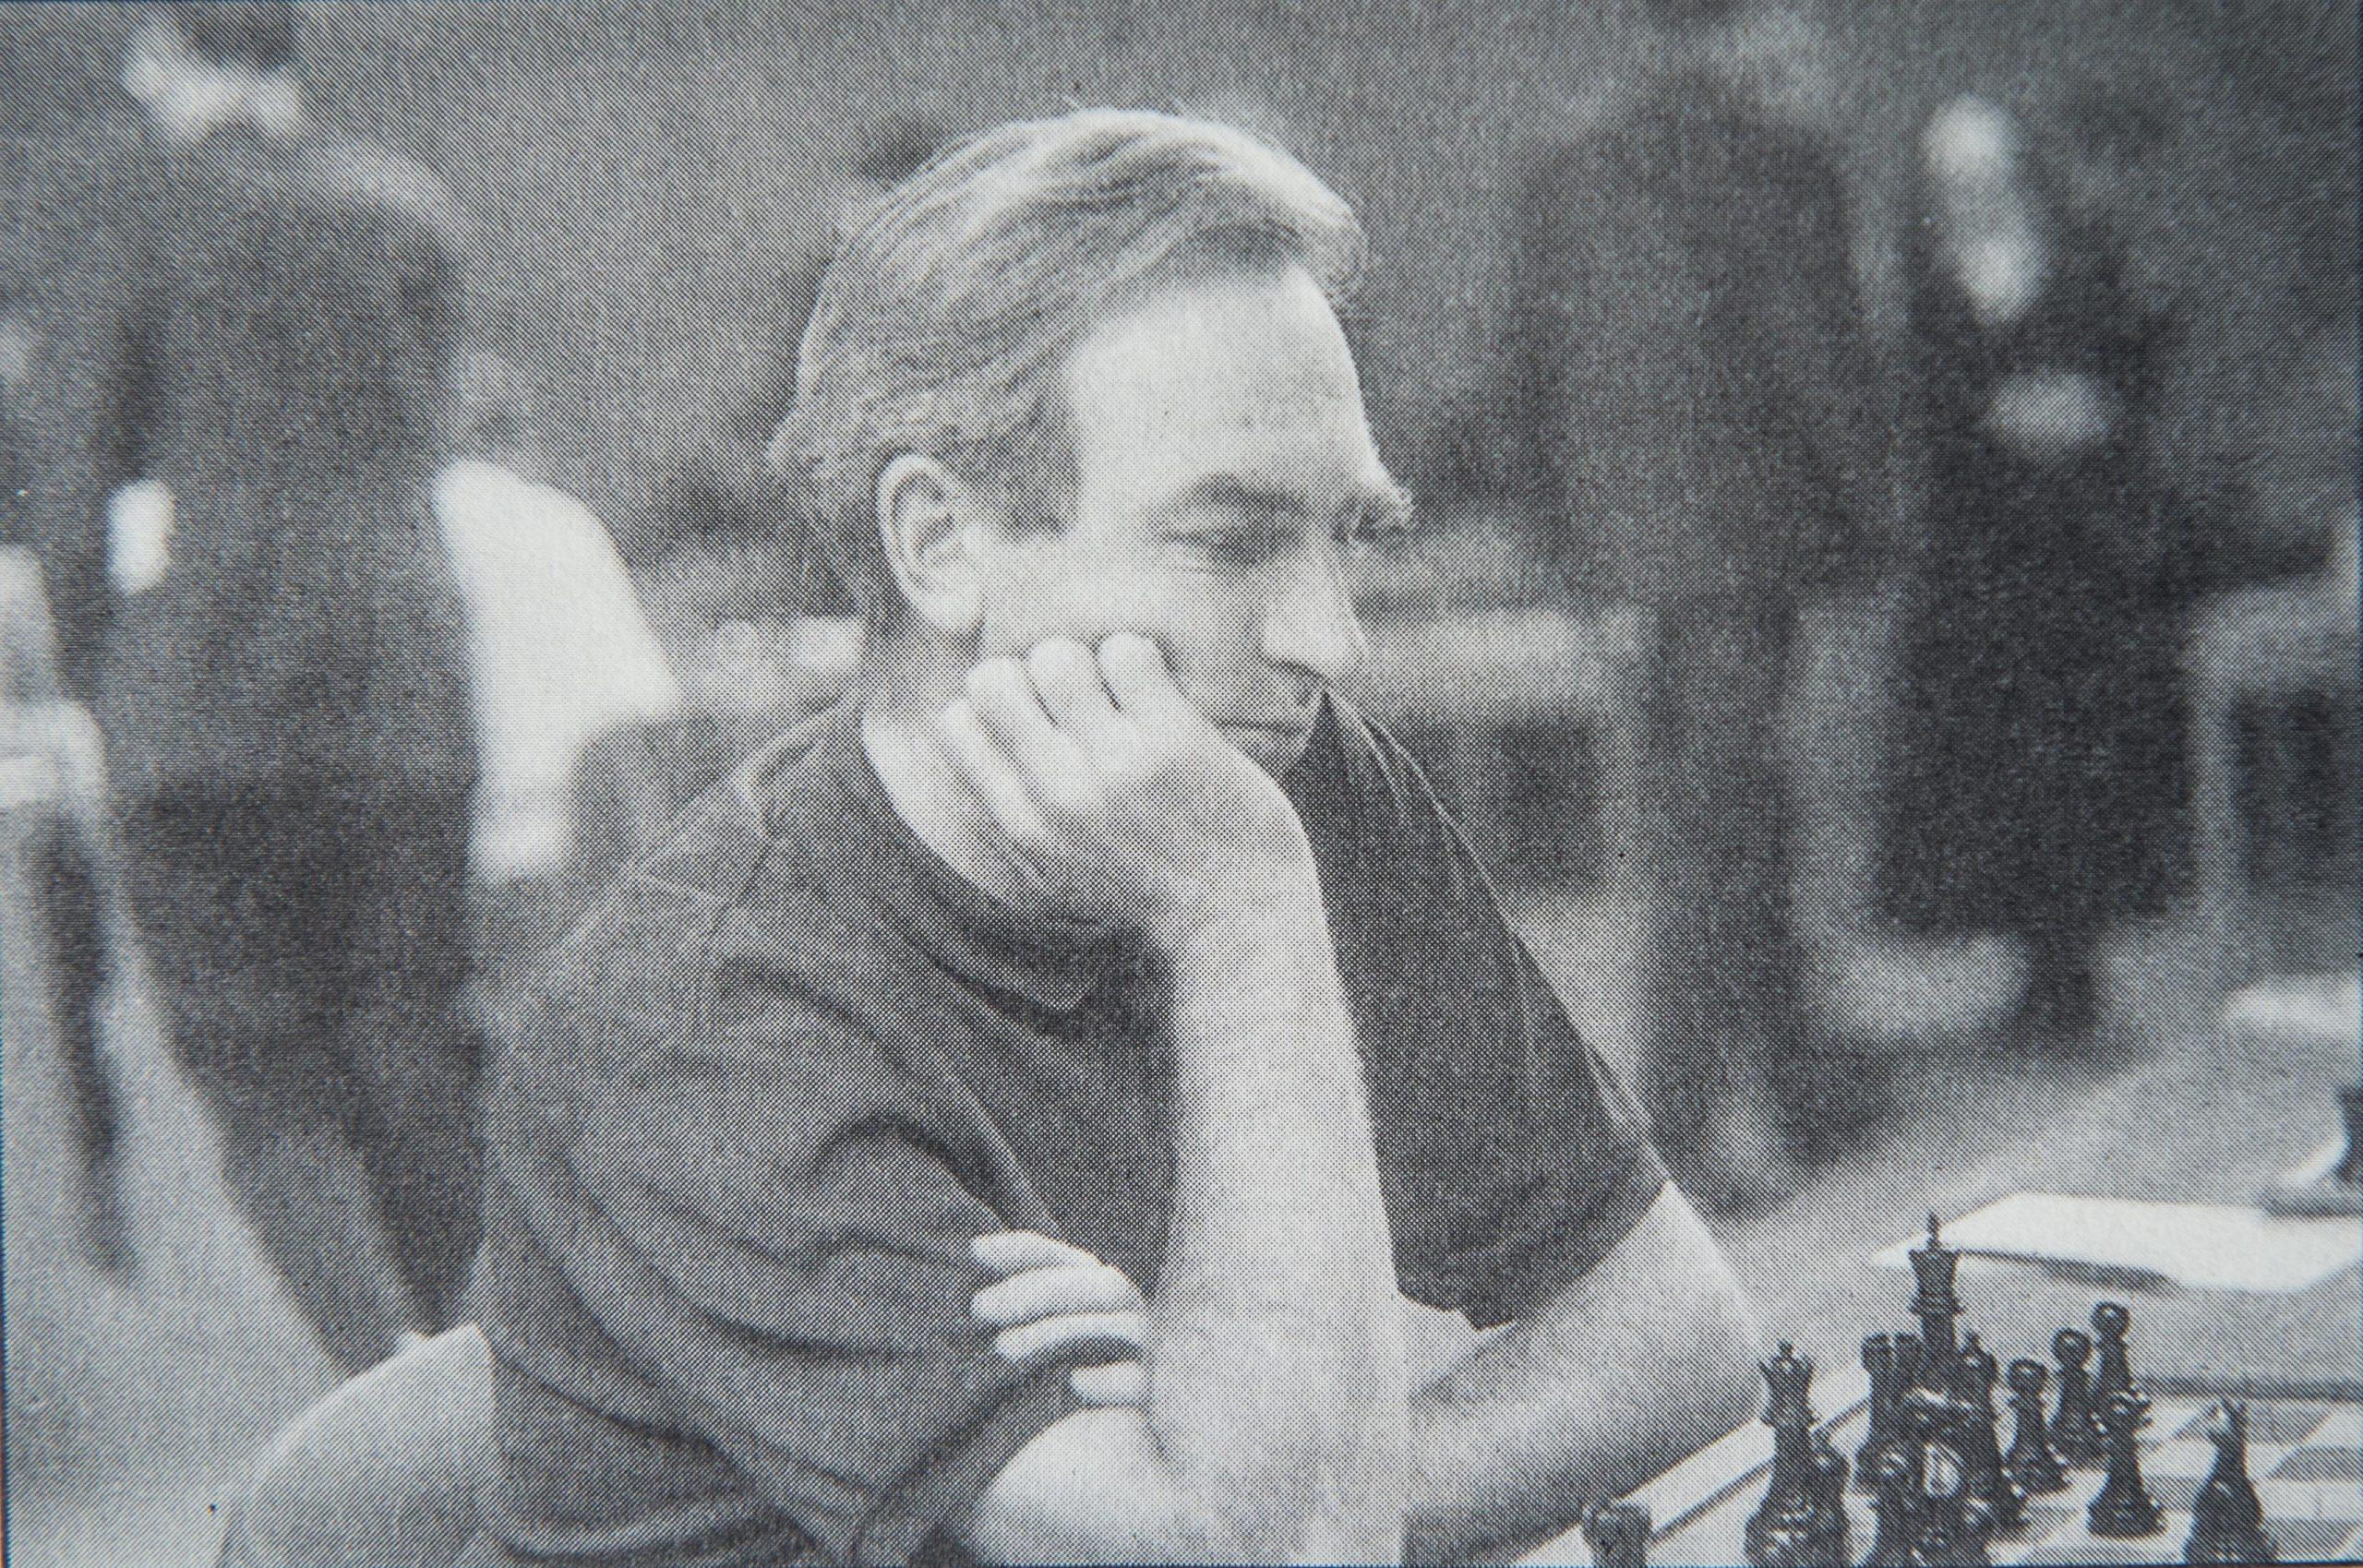 FM Peter Hugh Clarke (18-iii-1933, 11-xii-2014)